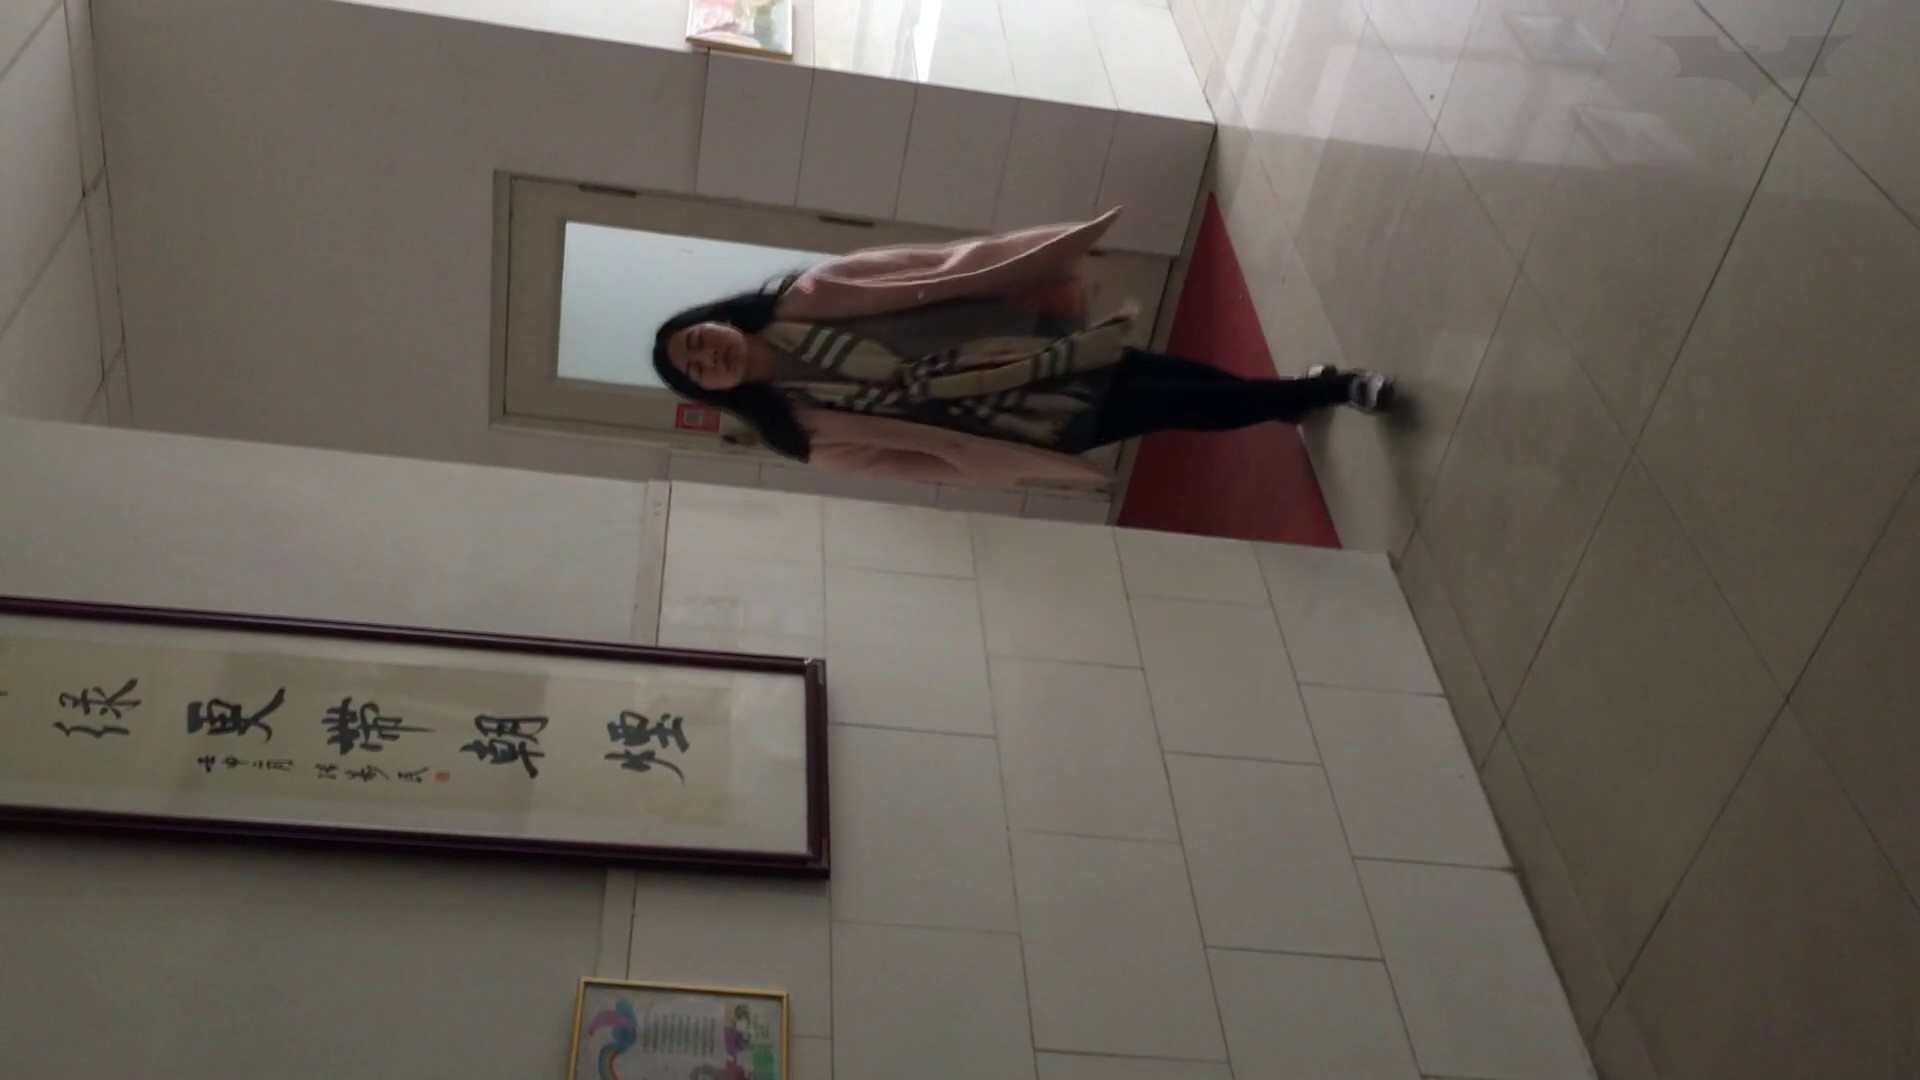 芸術大学ガチ潜入盗撮 JD盗撮 美女の洗面所の秘密 Vol.80 盛合せ  79PIX 11